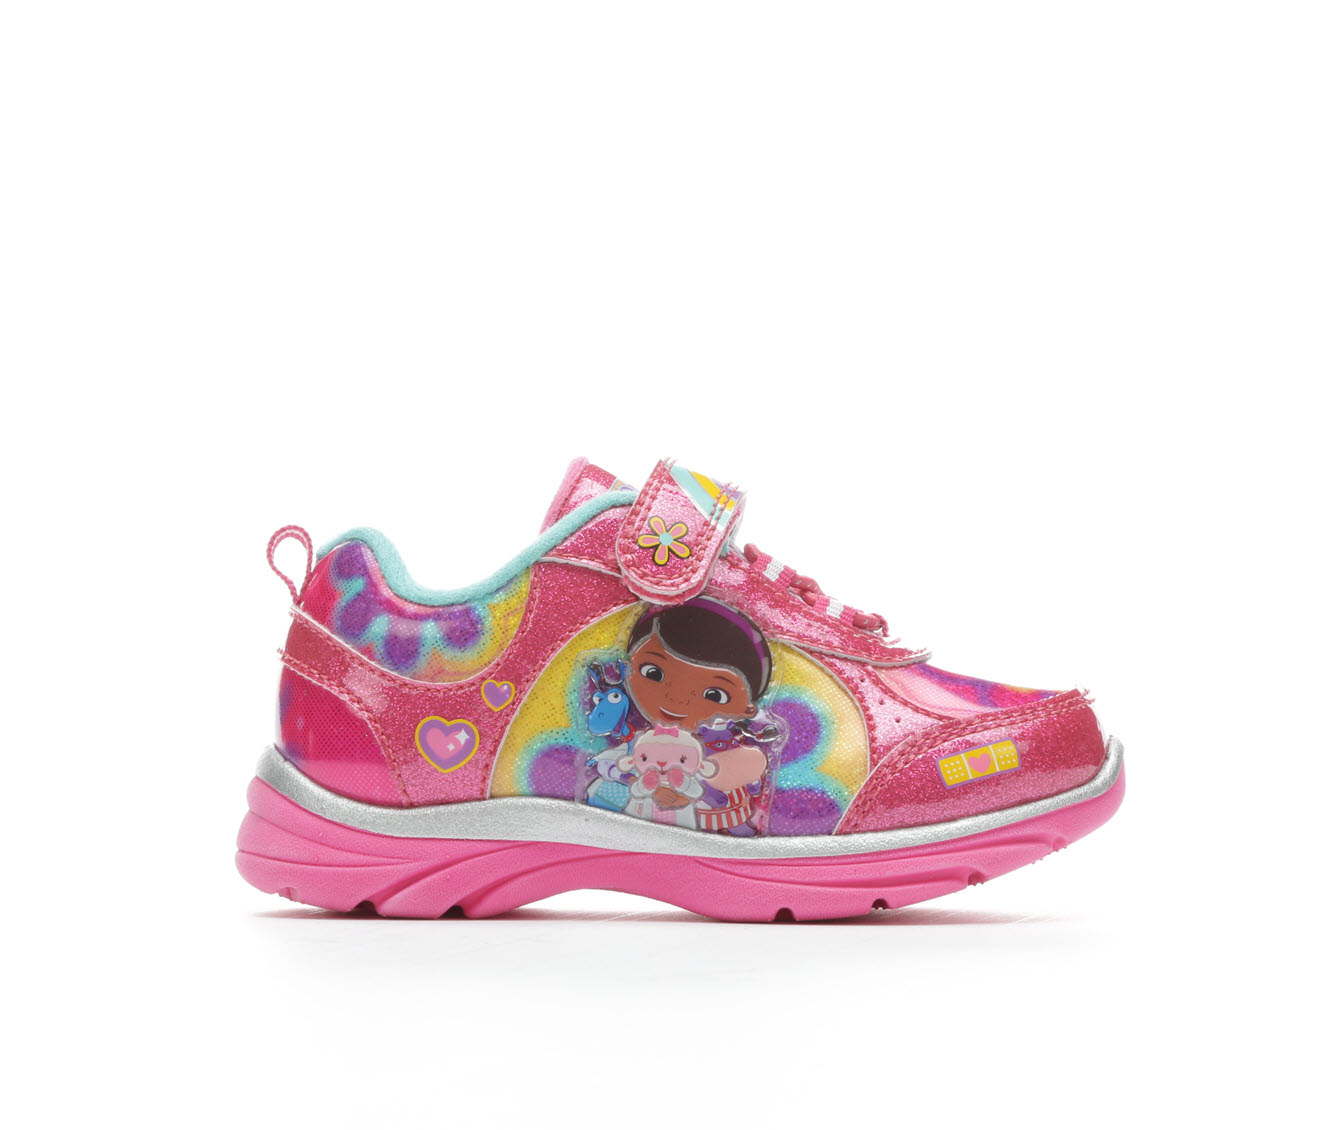 Girls' Disney Doc McStuffins Light-Up Sneakers (Pink)